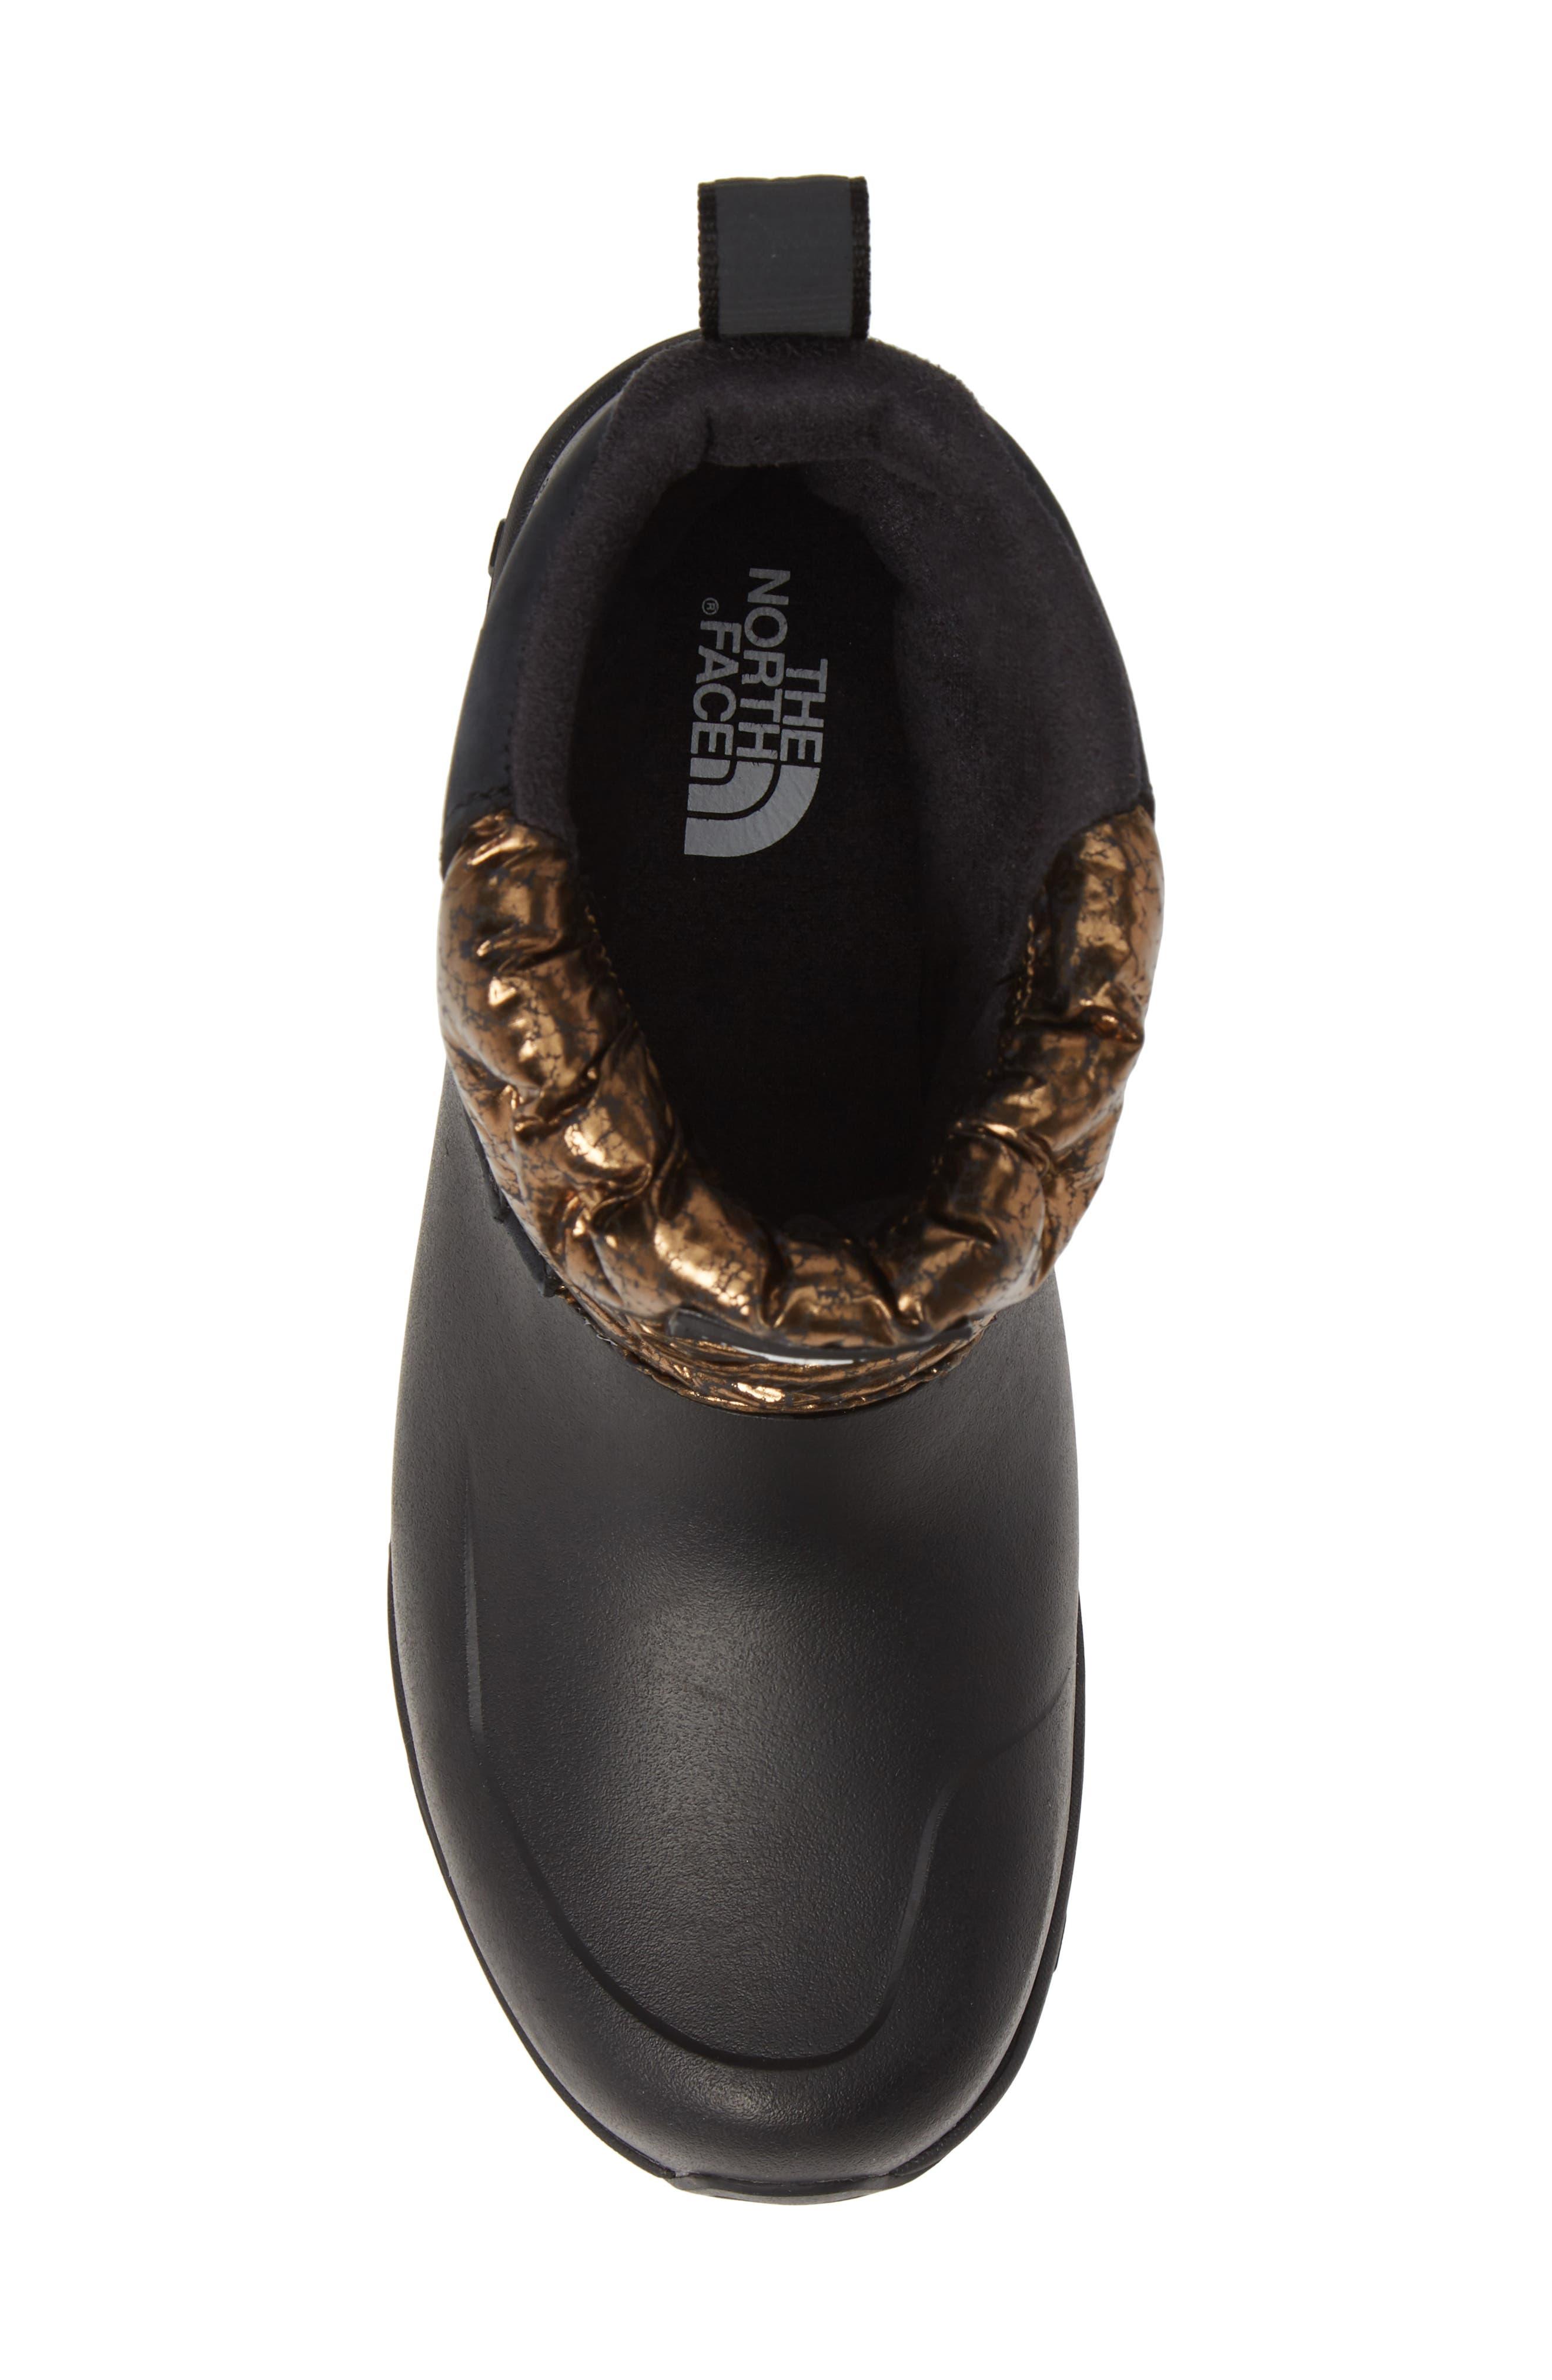 Yukiona Waterproof Ankle Boot,                             Alternate thumbnail 5, color,                             BLACK/ METALLIC COPPER